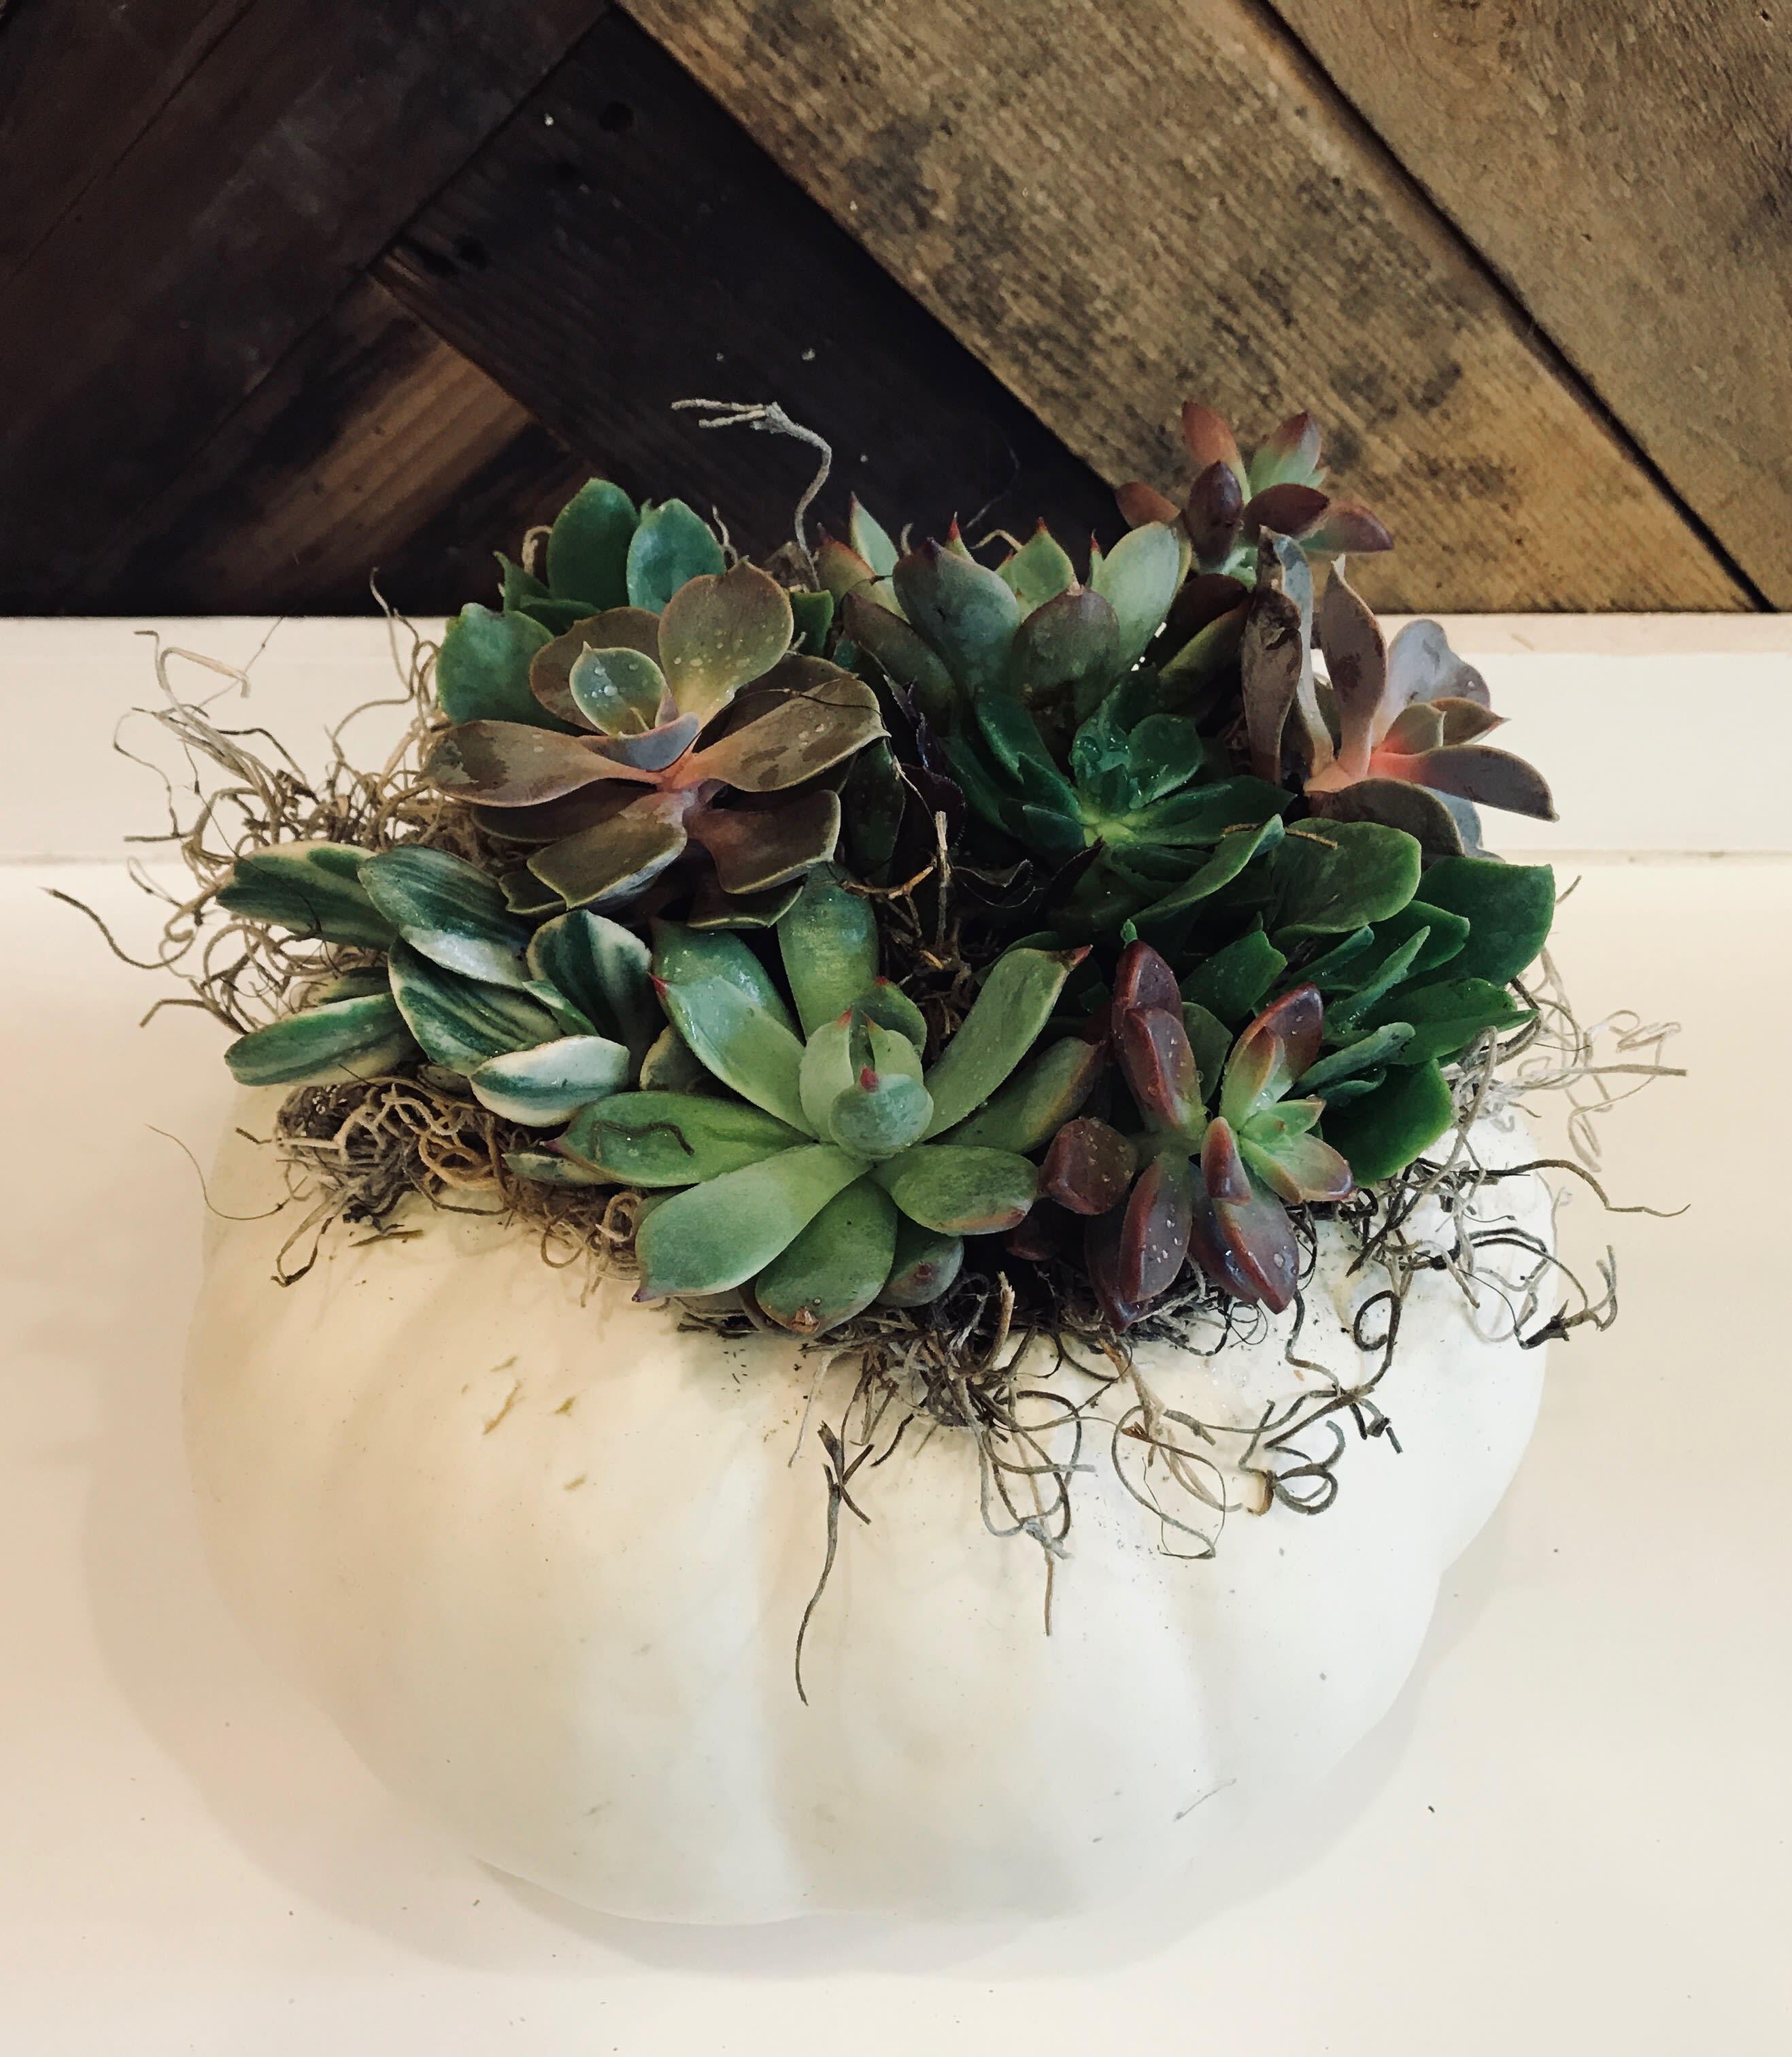 Living Succulent Pumpkin Centerpiece Available September November In Port Orchard Wa Pistil Design